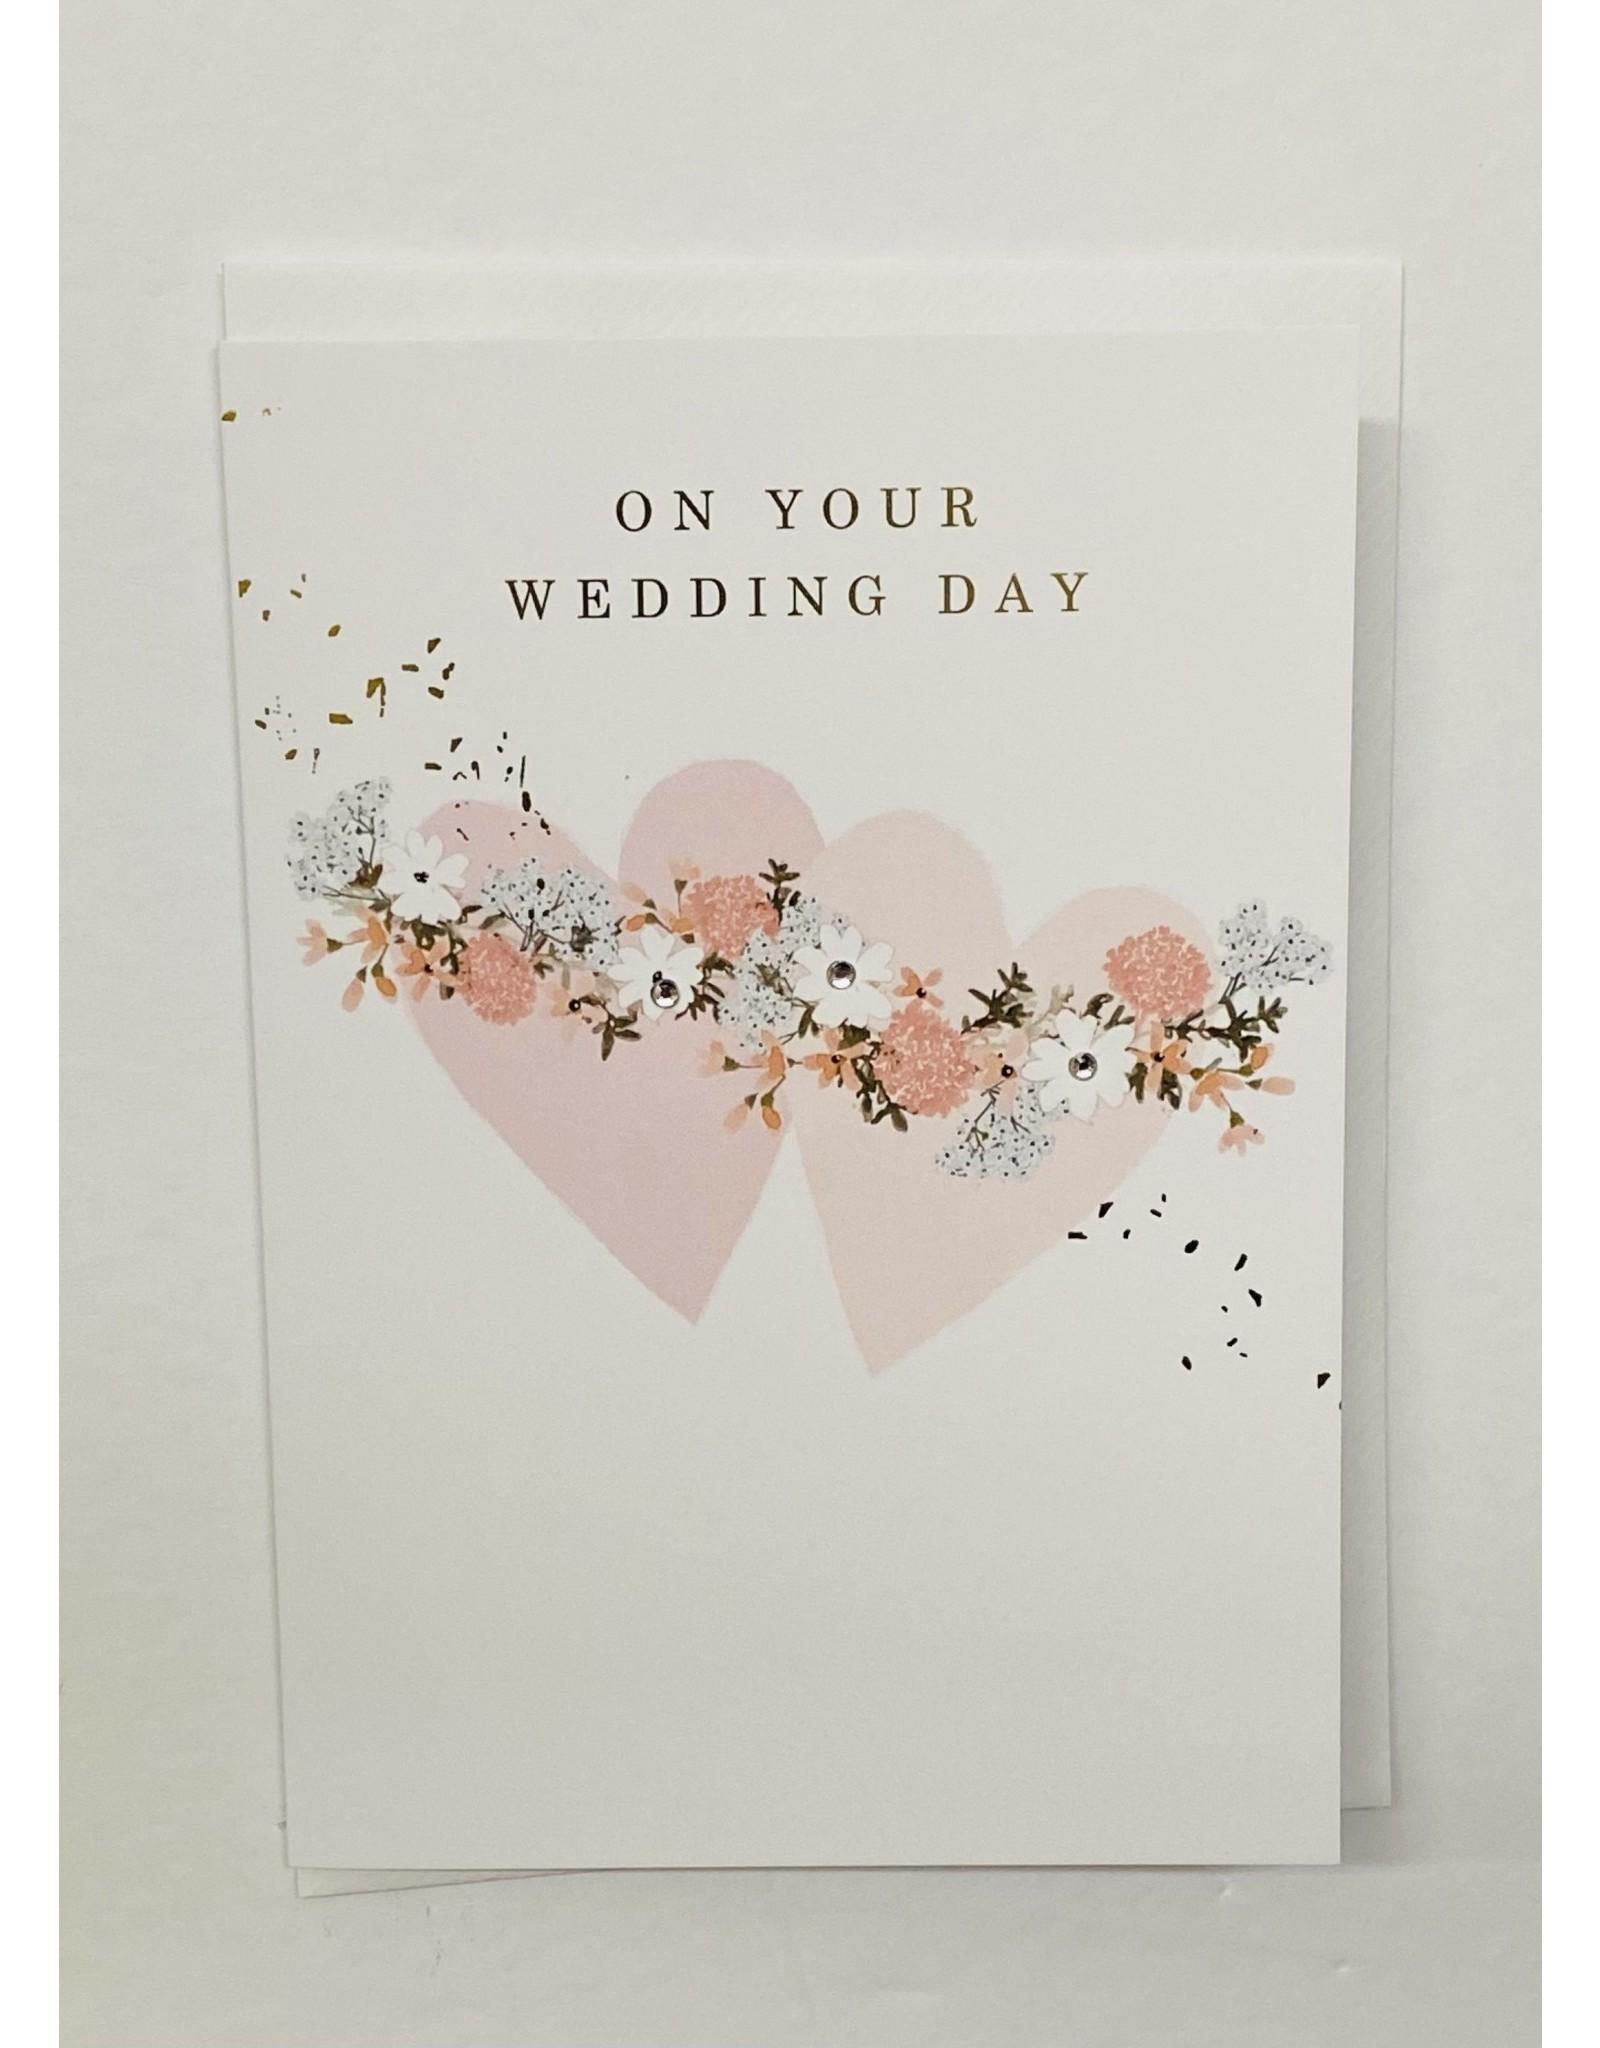 Wedding - On Your Wedding Day Hearts